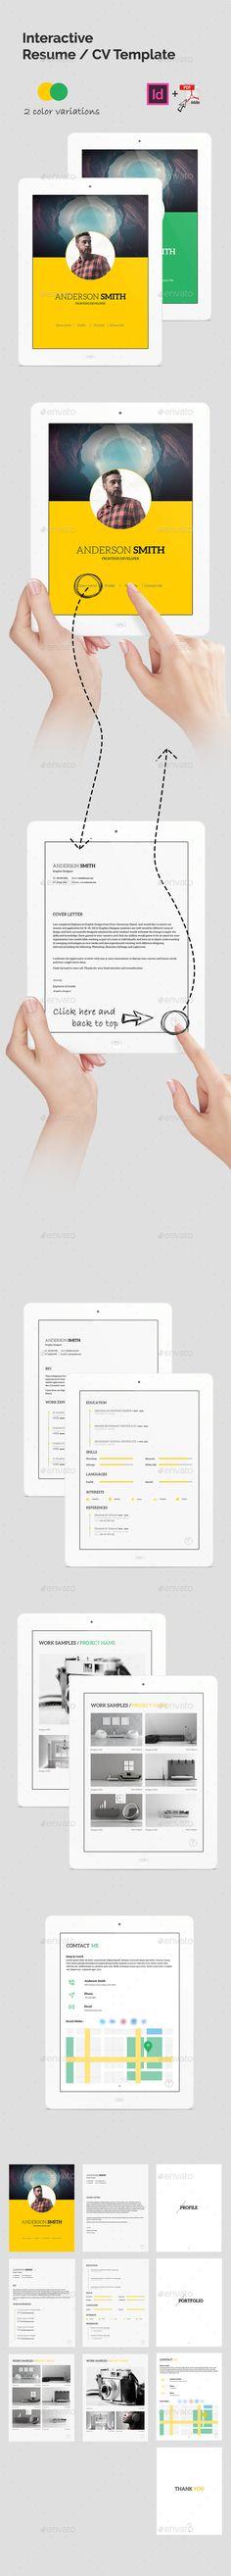 Event Organizer Resume Cv template, Creative resume templates - interactive resume template